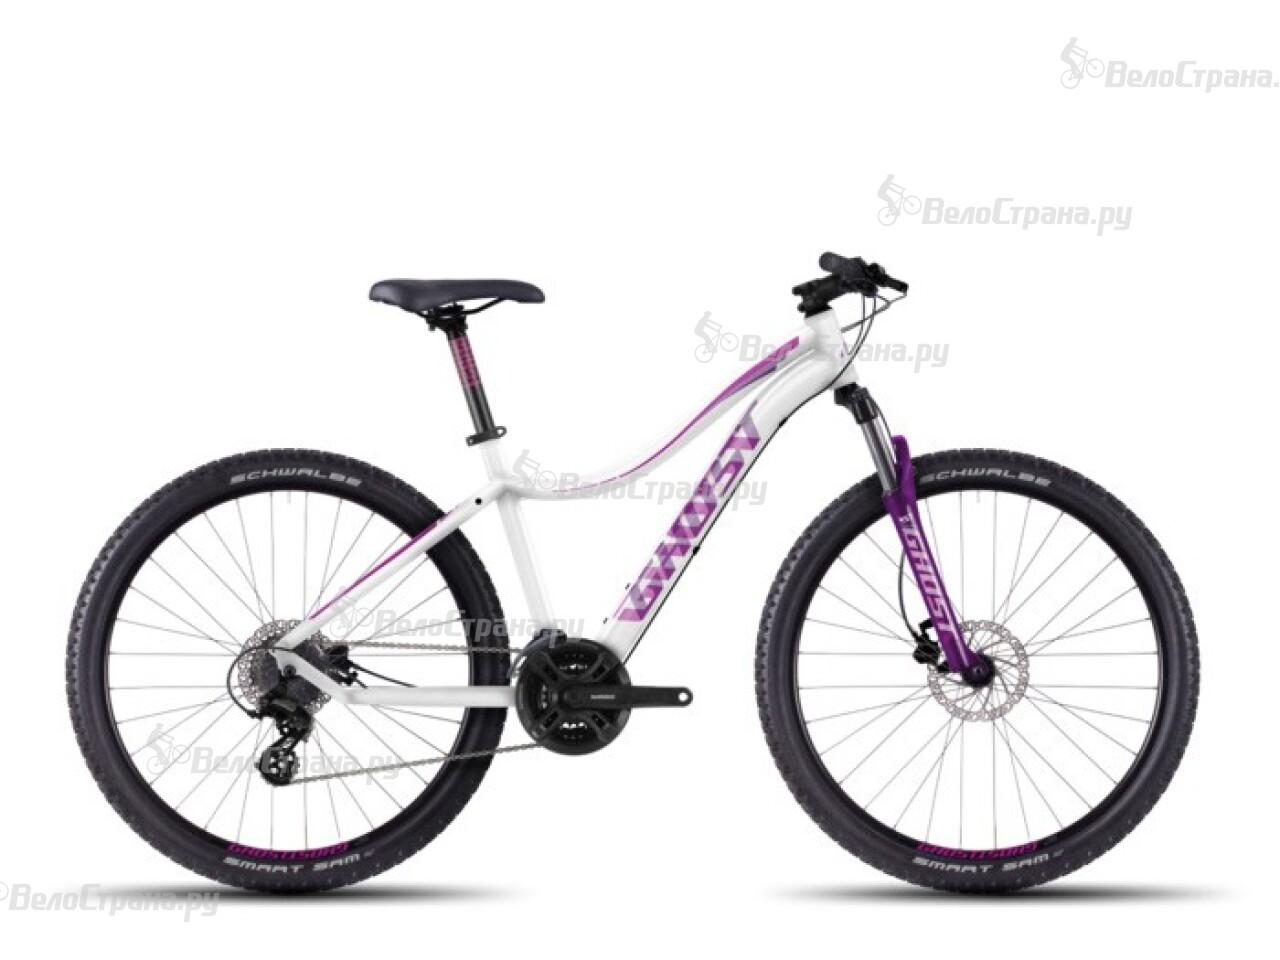 Велосипед Ghost Lanao 1 (2016) велосипед ghost lanao 3 2015